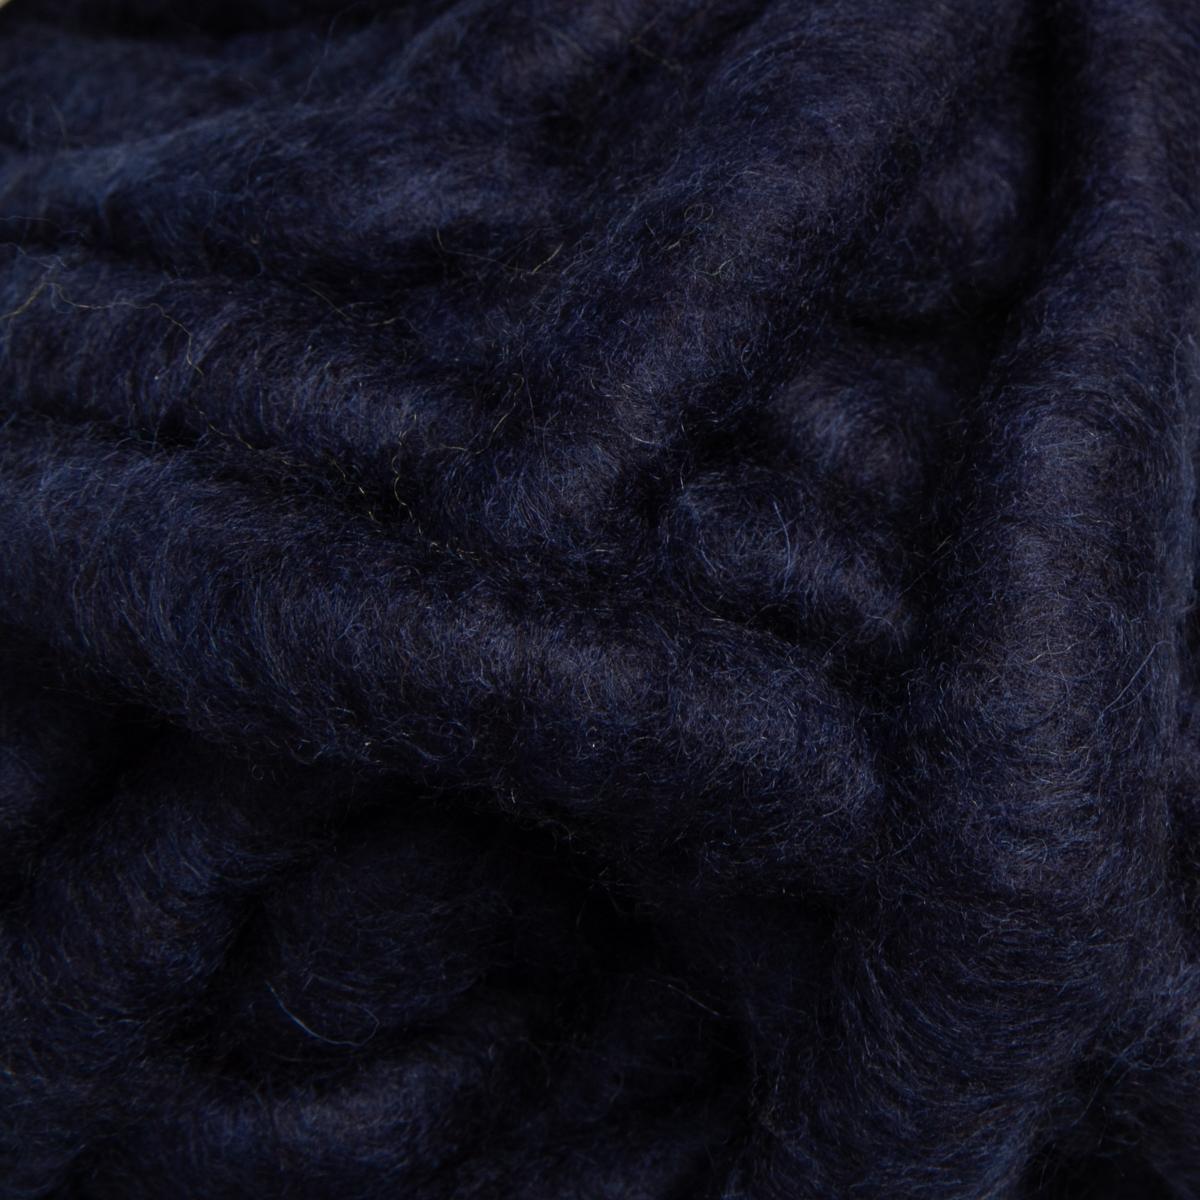 3pk-Lion-Brand-Wow-Acrylic-amp-Wool-yarn-Jumbo-7-Knitting-Crocheting-Skeins-Soft thumbnail 29